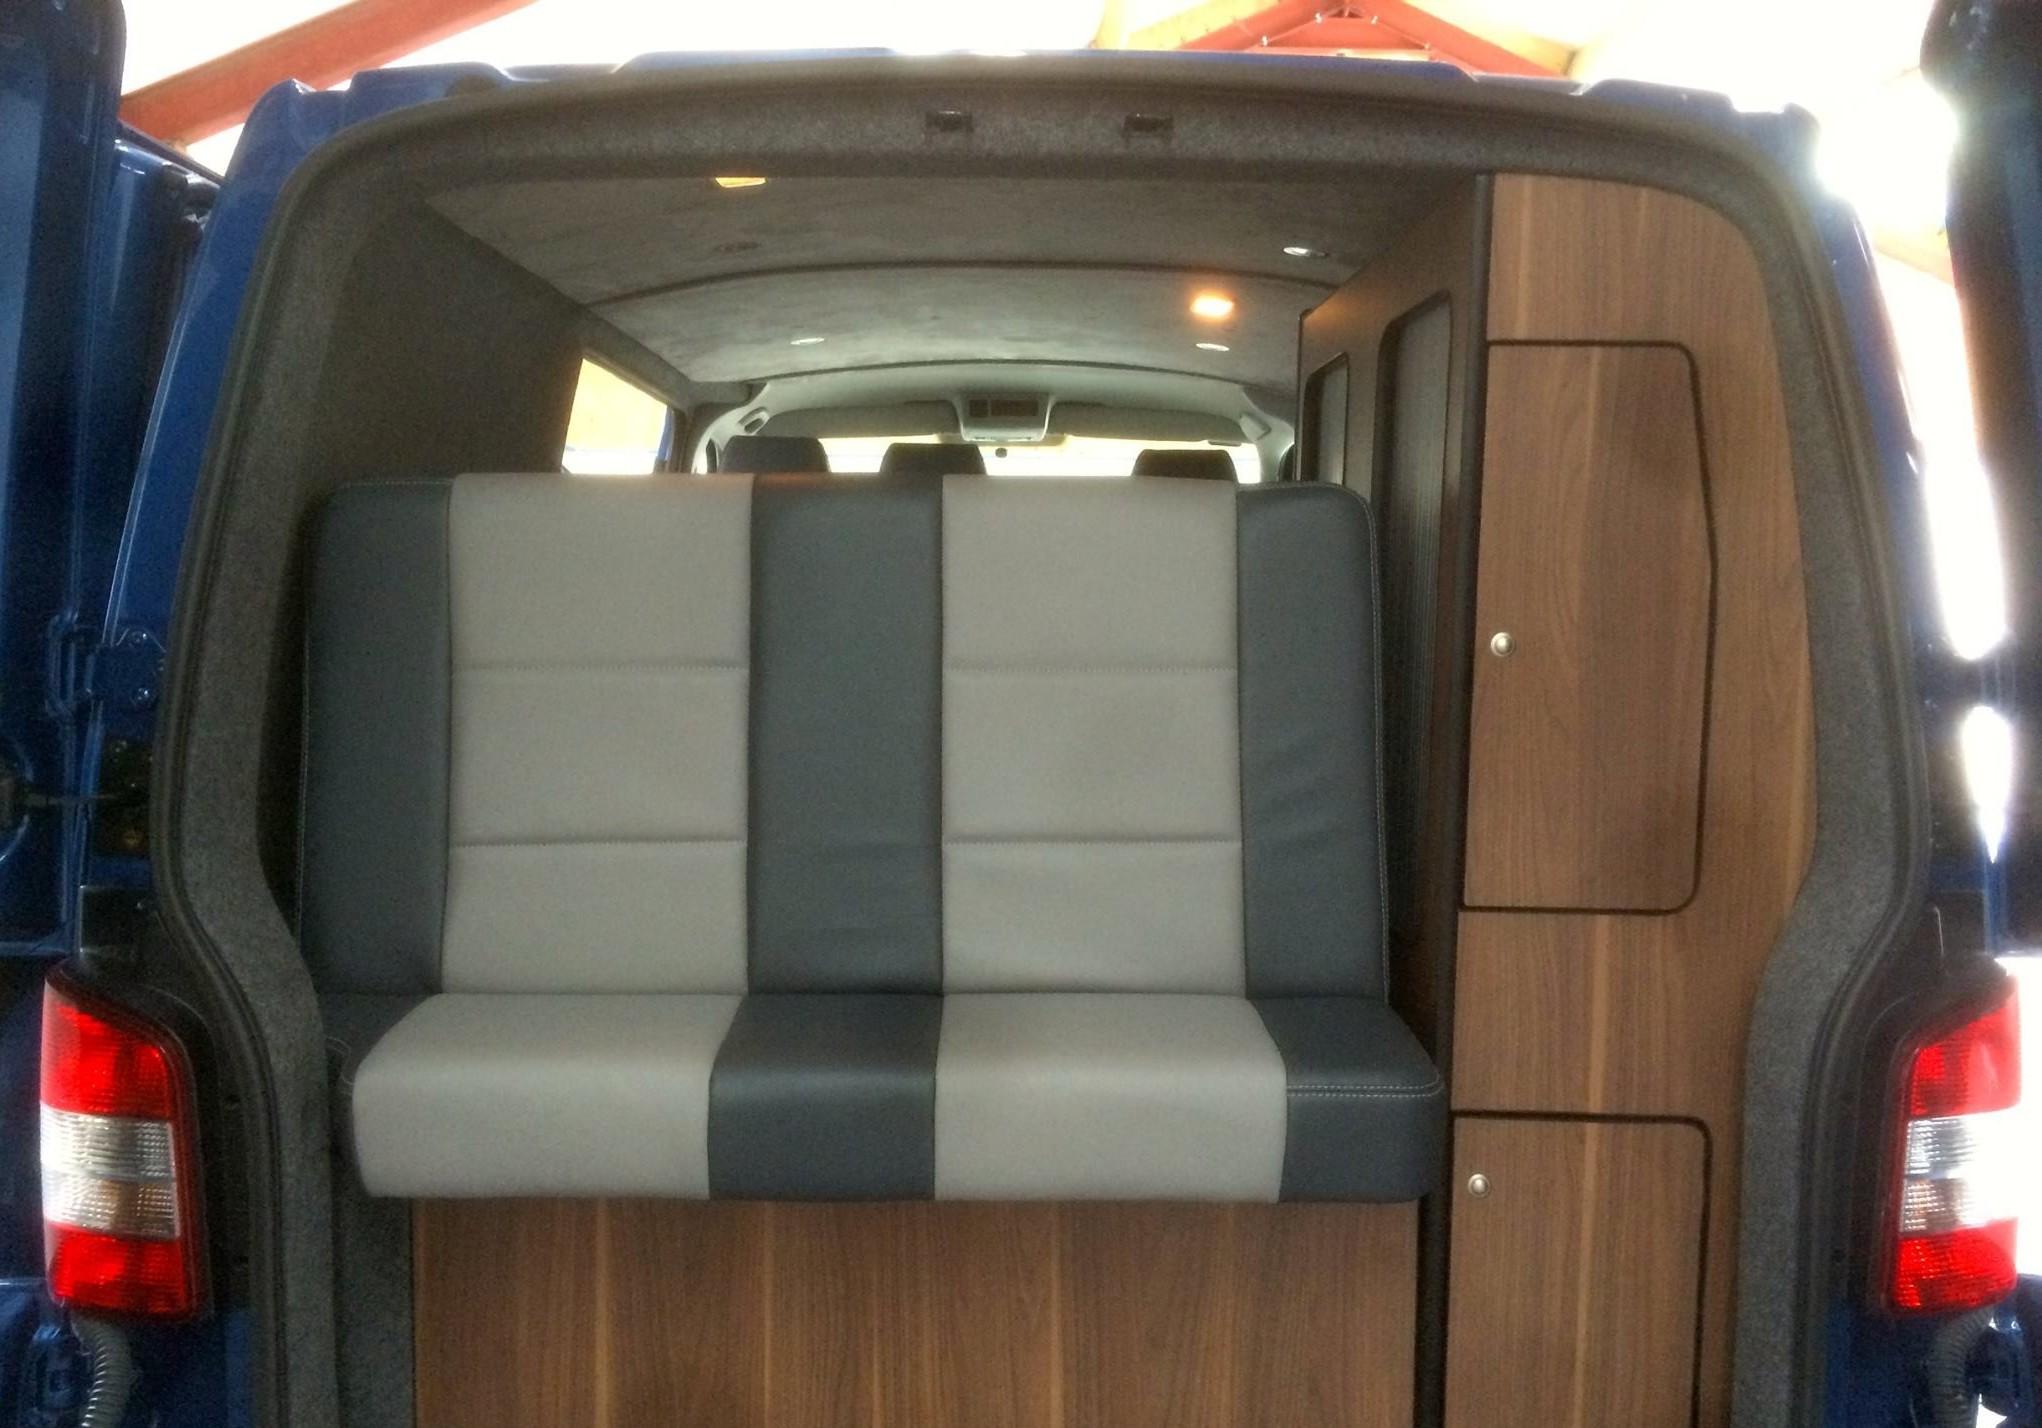 Chelmsford c&er can storage units & Chelmsford Camper Van Storage Units | Johnsons Auto Electrics